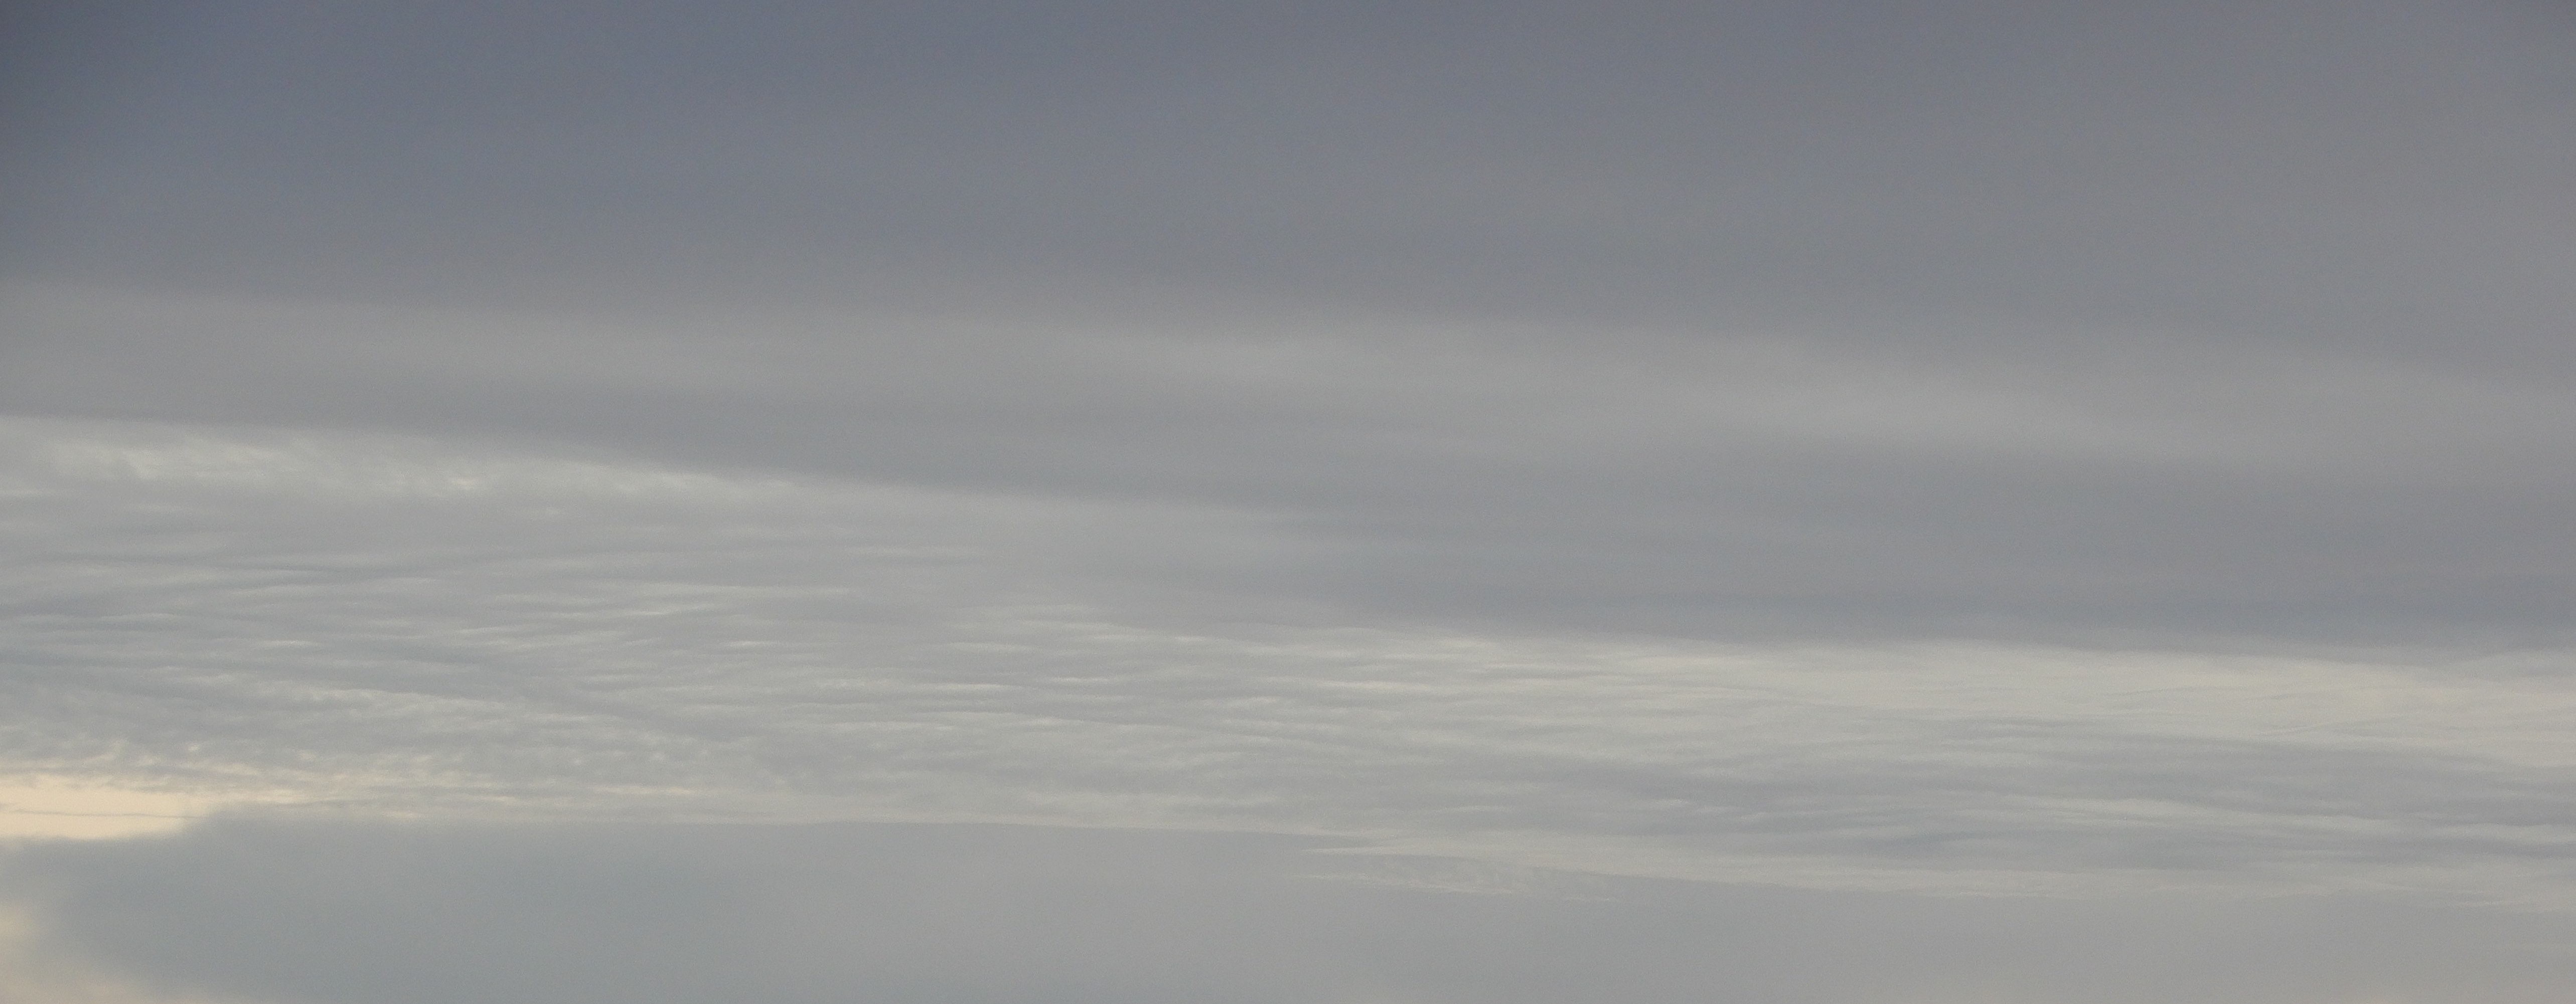 14.sky looks like ocean